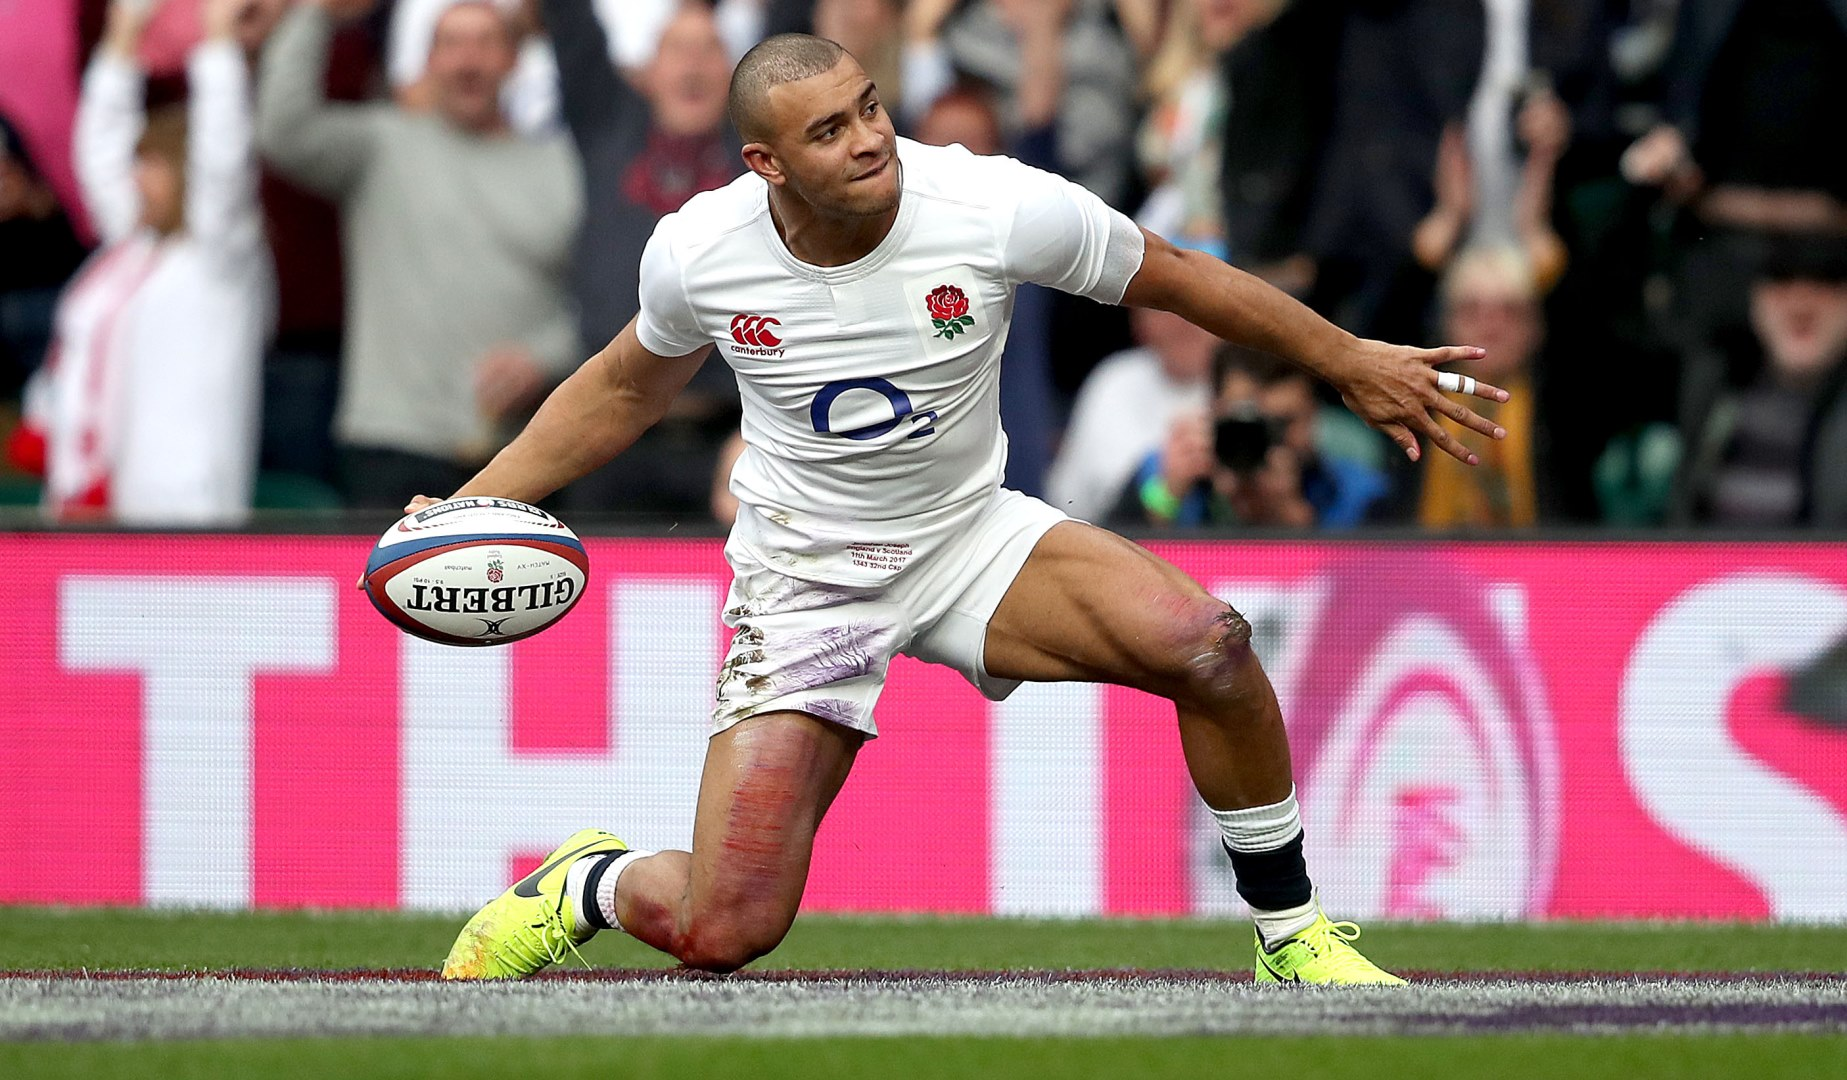 LionsWatch: Joseph stars as England seal 2017 RBS 6 Nations